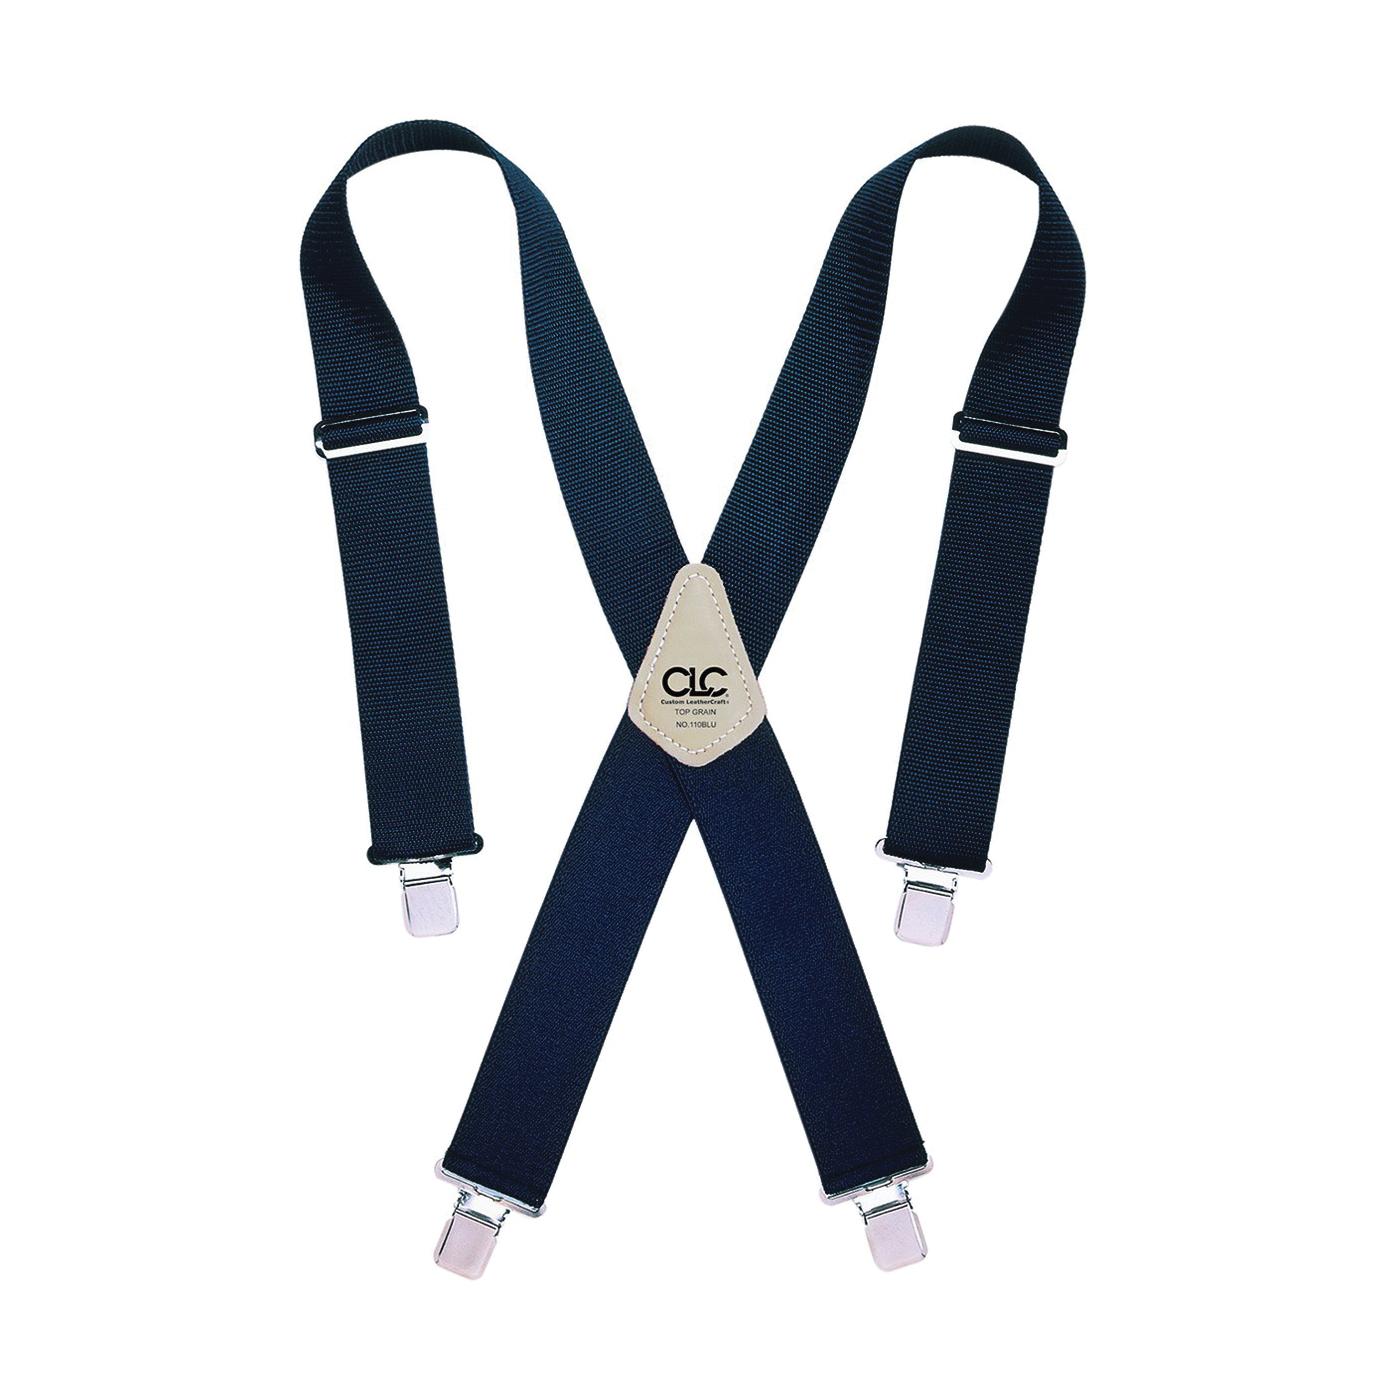 Picture of CLC Tool Works 110BLU Work Suspender, Nylon, Blue